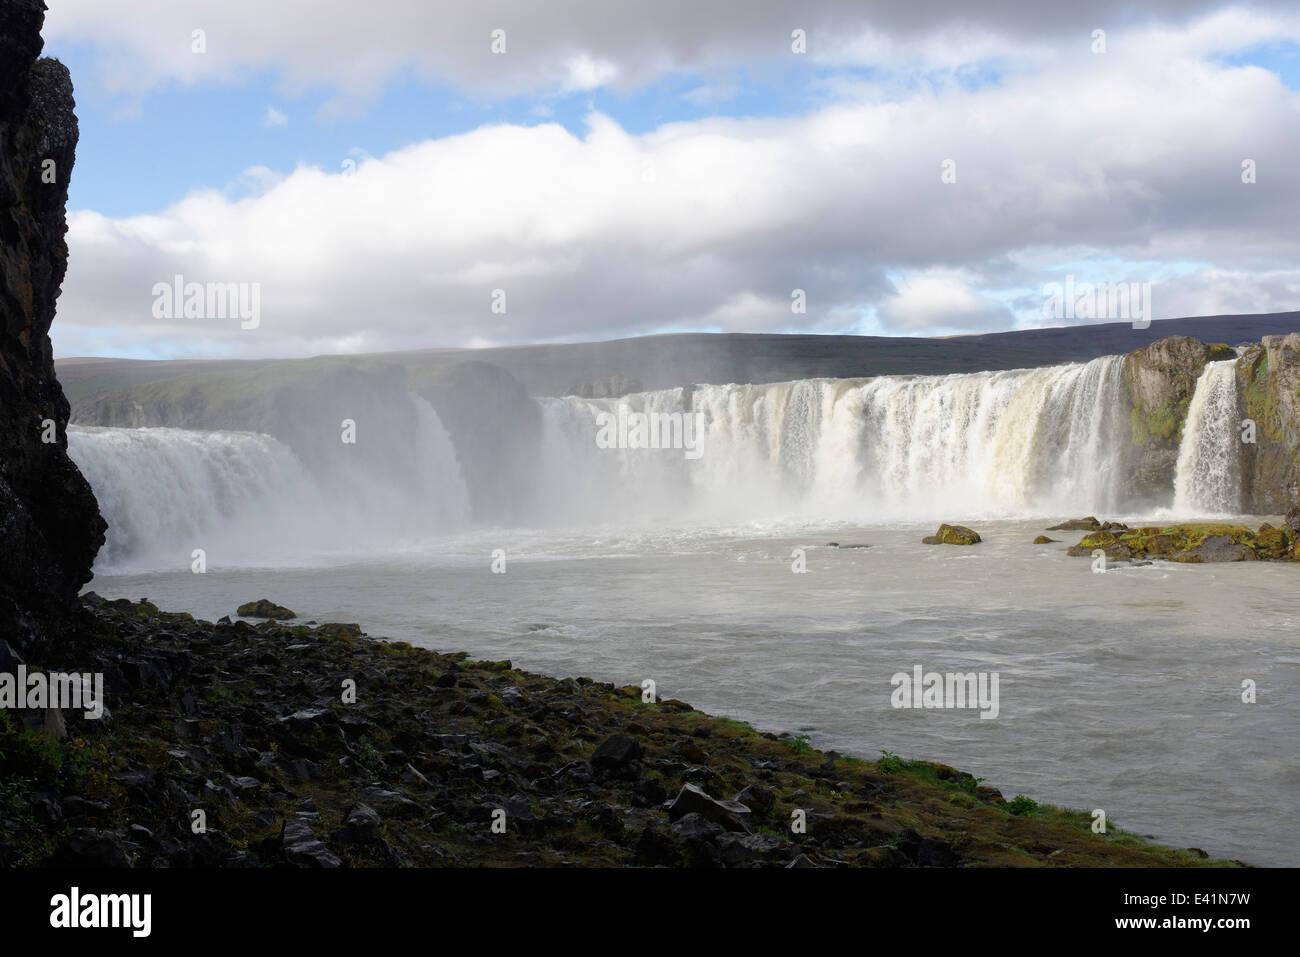 Godafoss, waterfall of the gods or godi, river Skjalfandafljot, Thingeyjarsveit, Myvatn district of North-Central - Stock Image